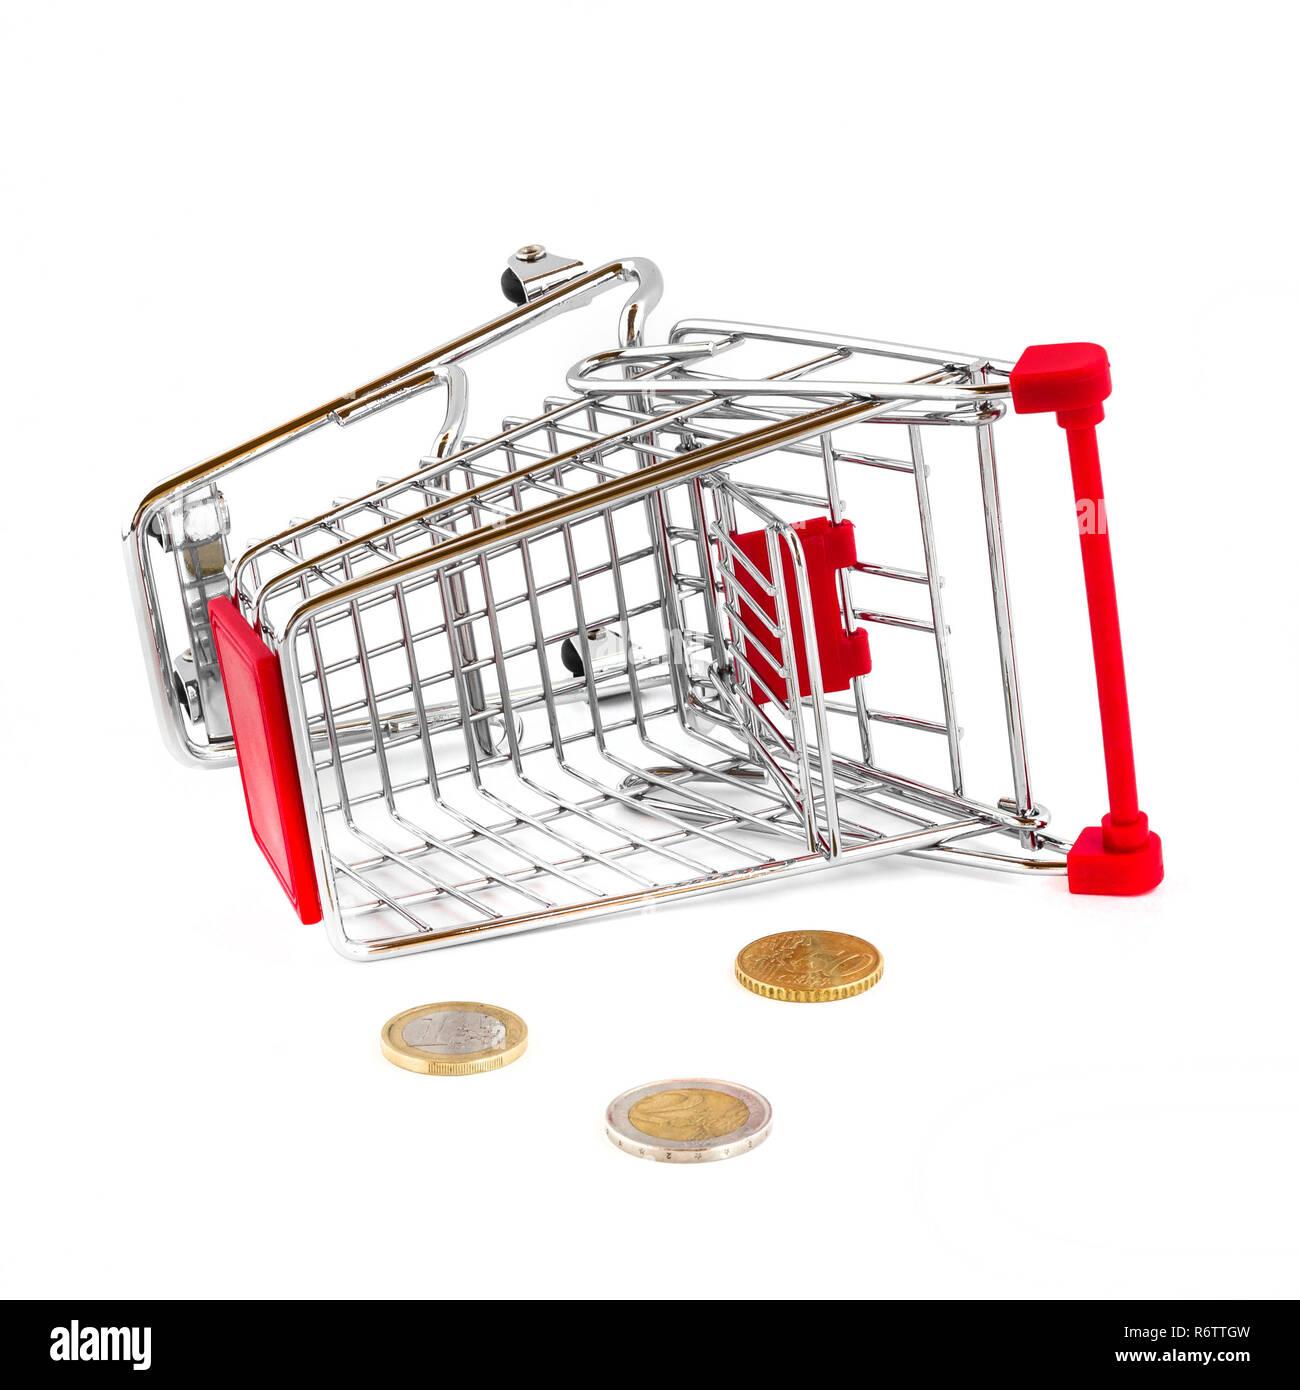 Cart broken and money fallen out - Stock Image